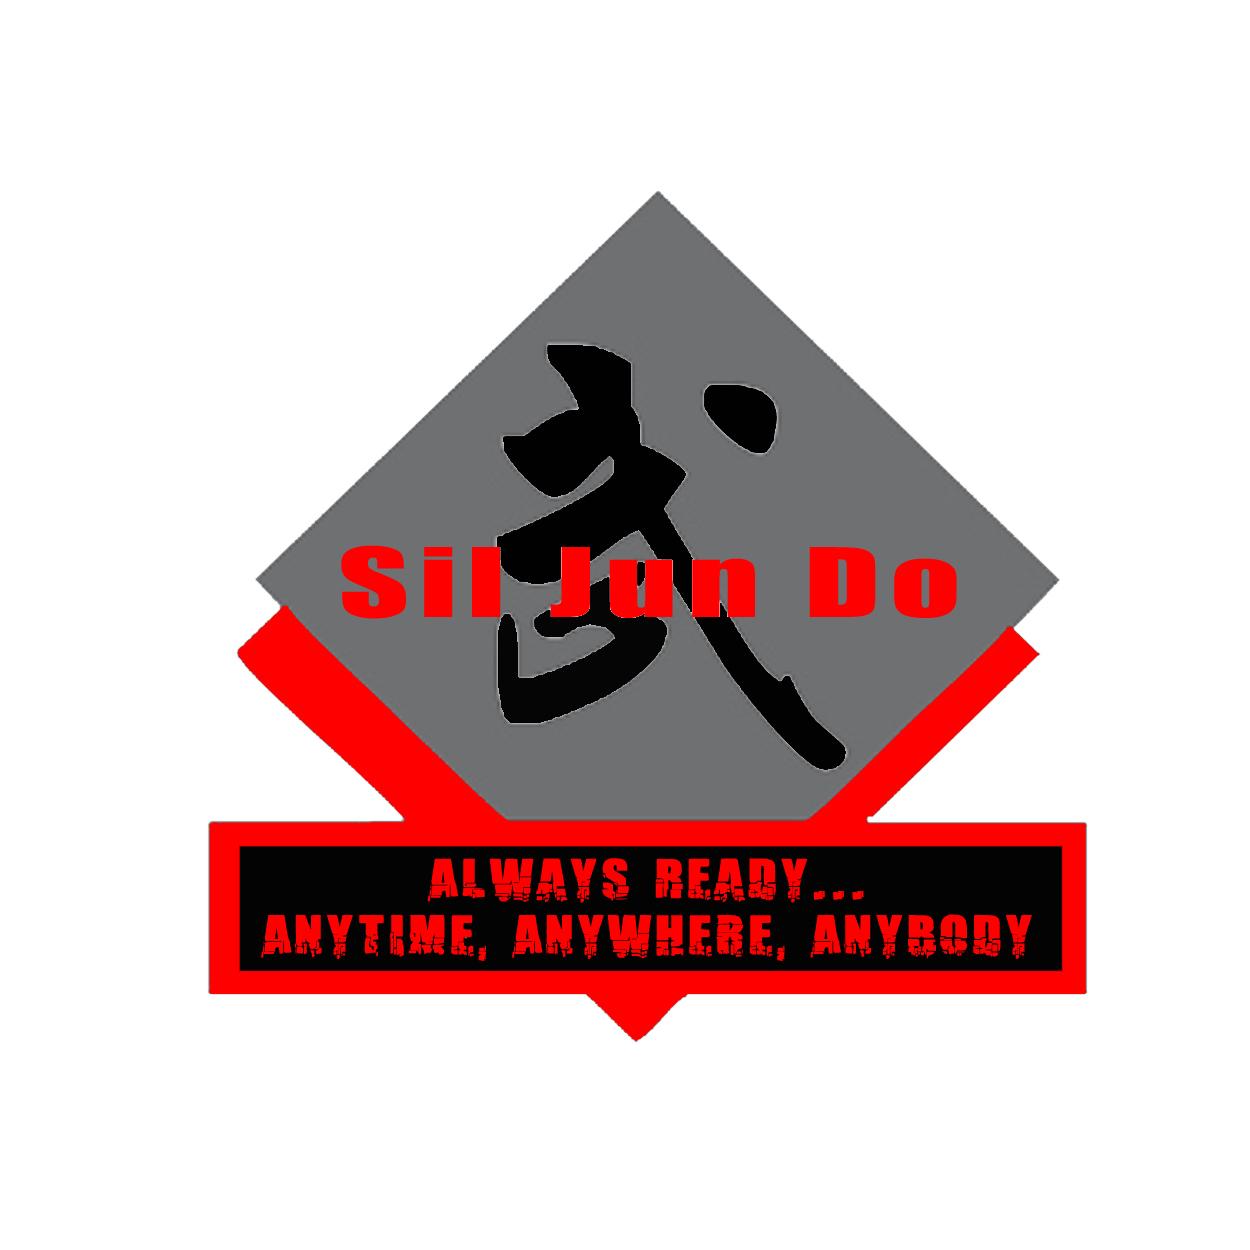 sjd+logo+copy